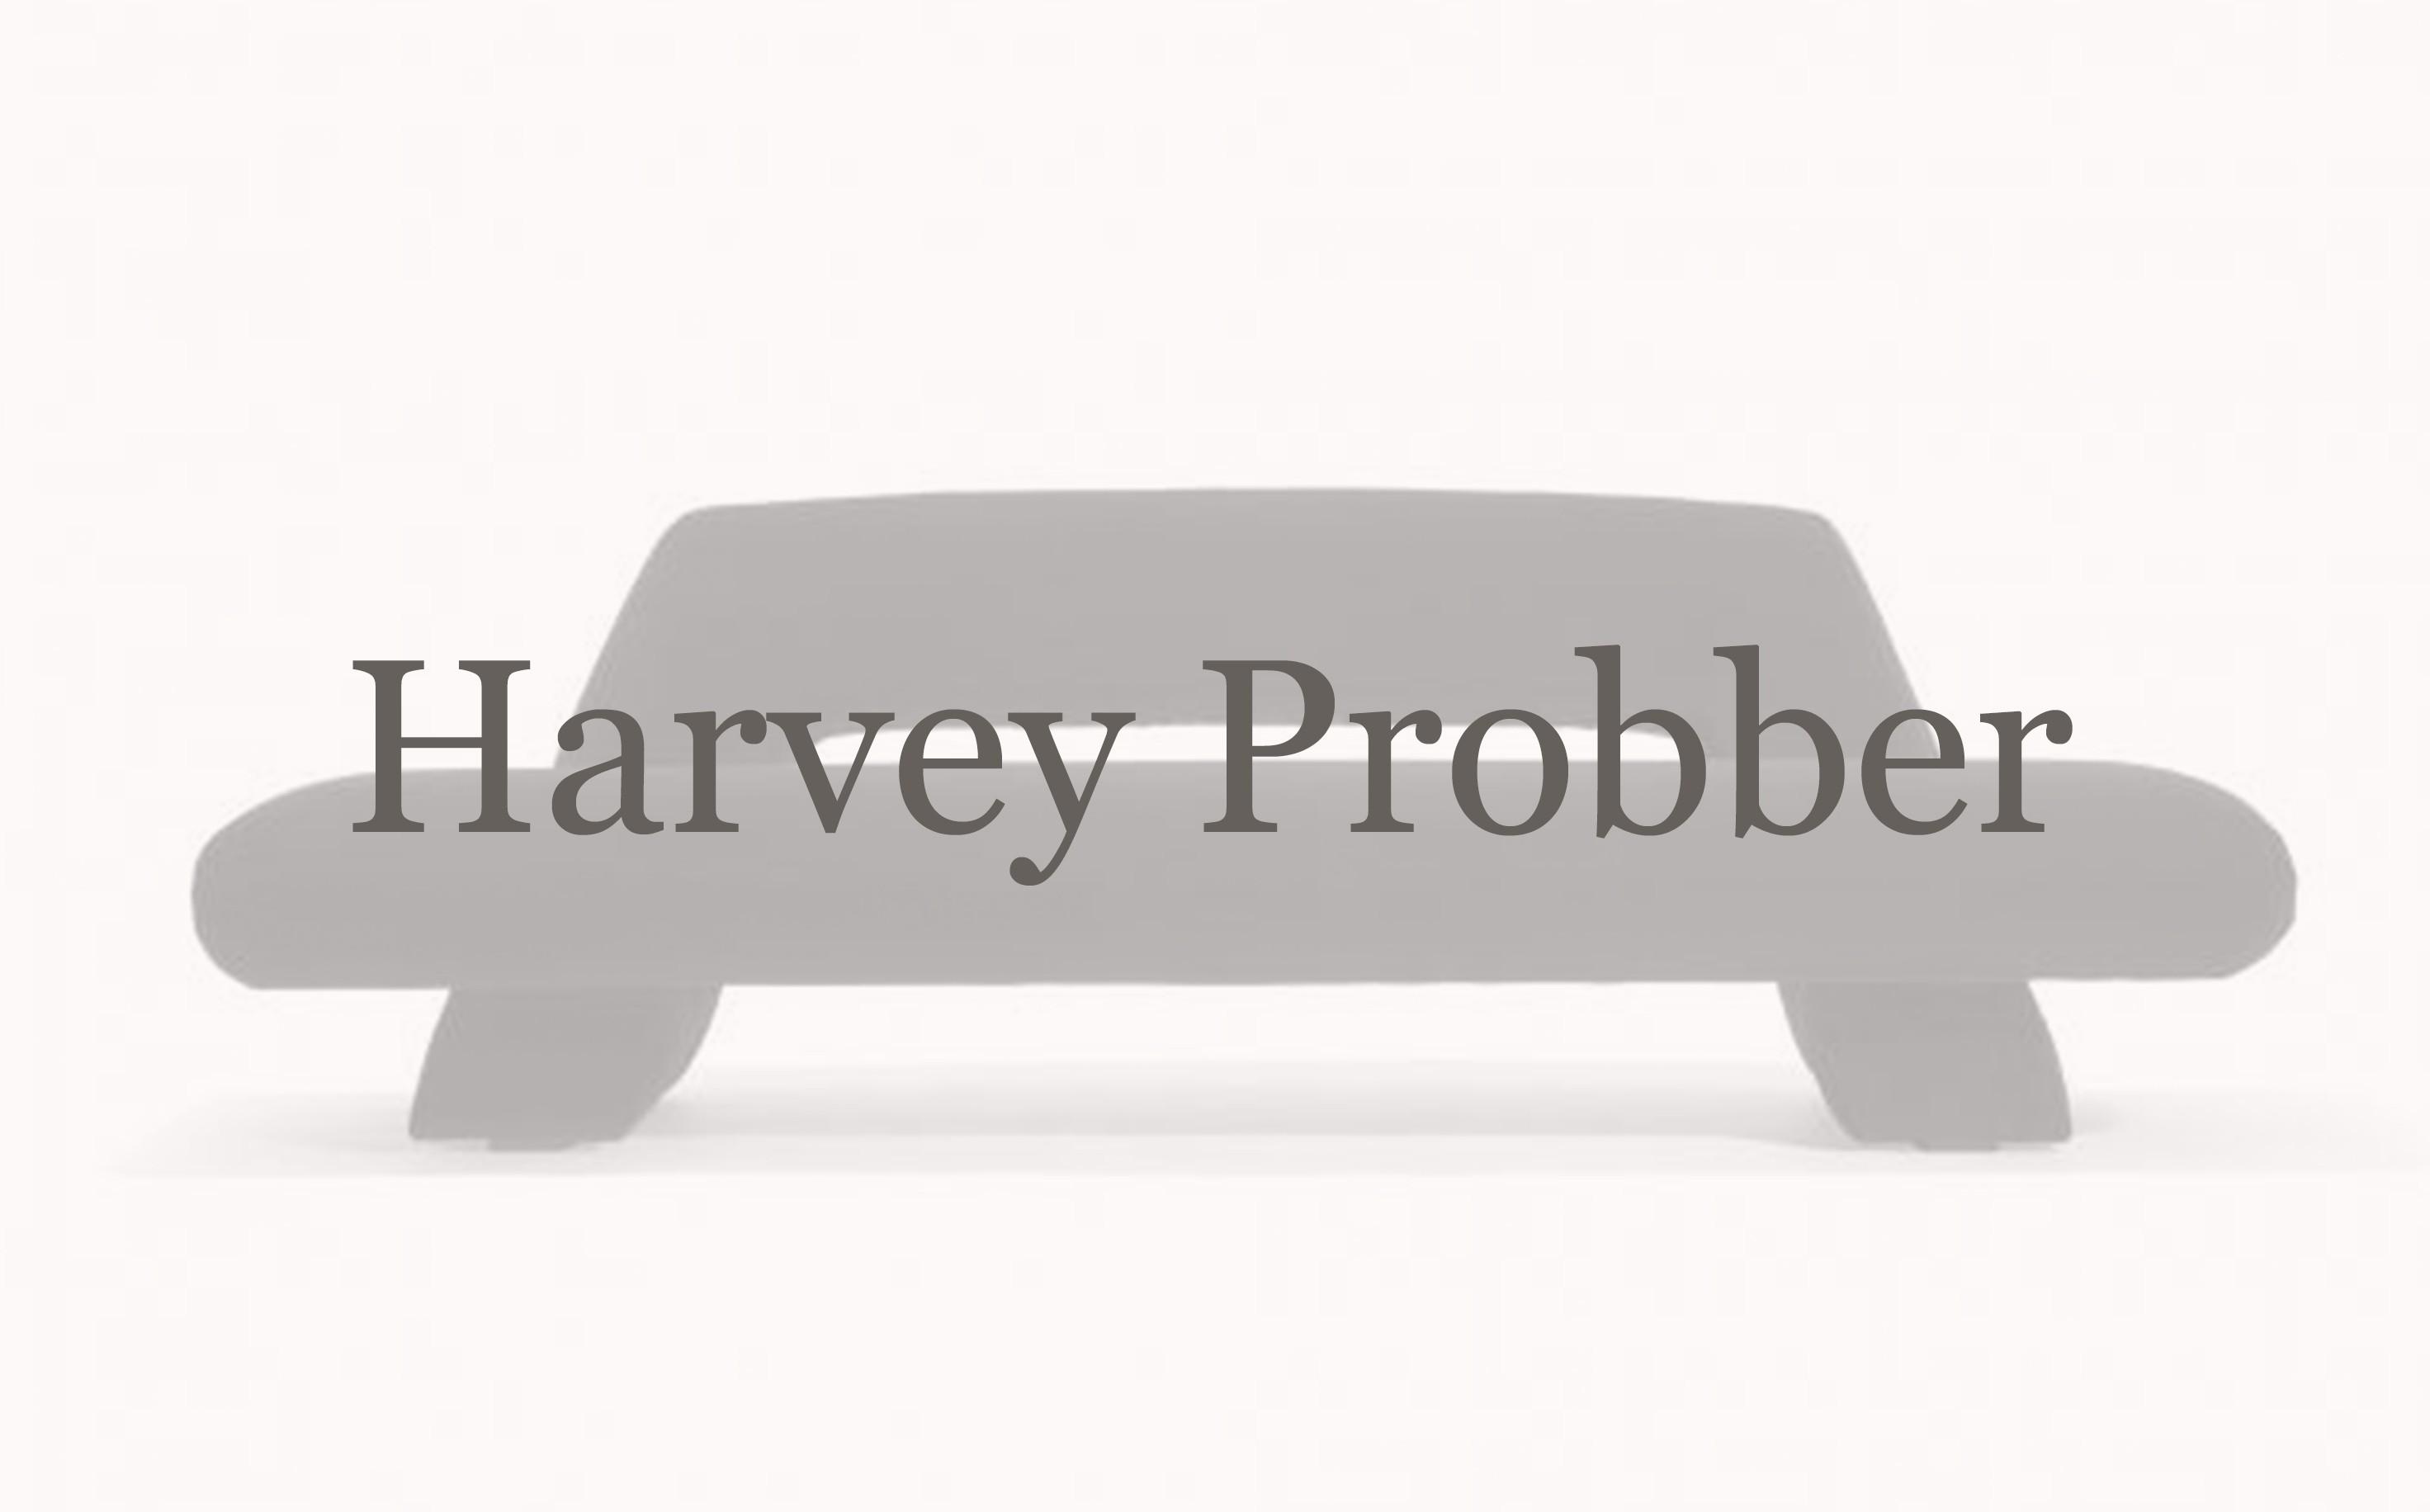 Harvey Probber